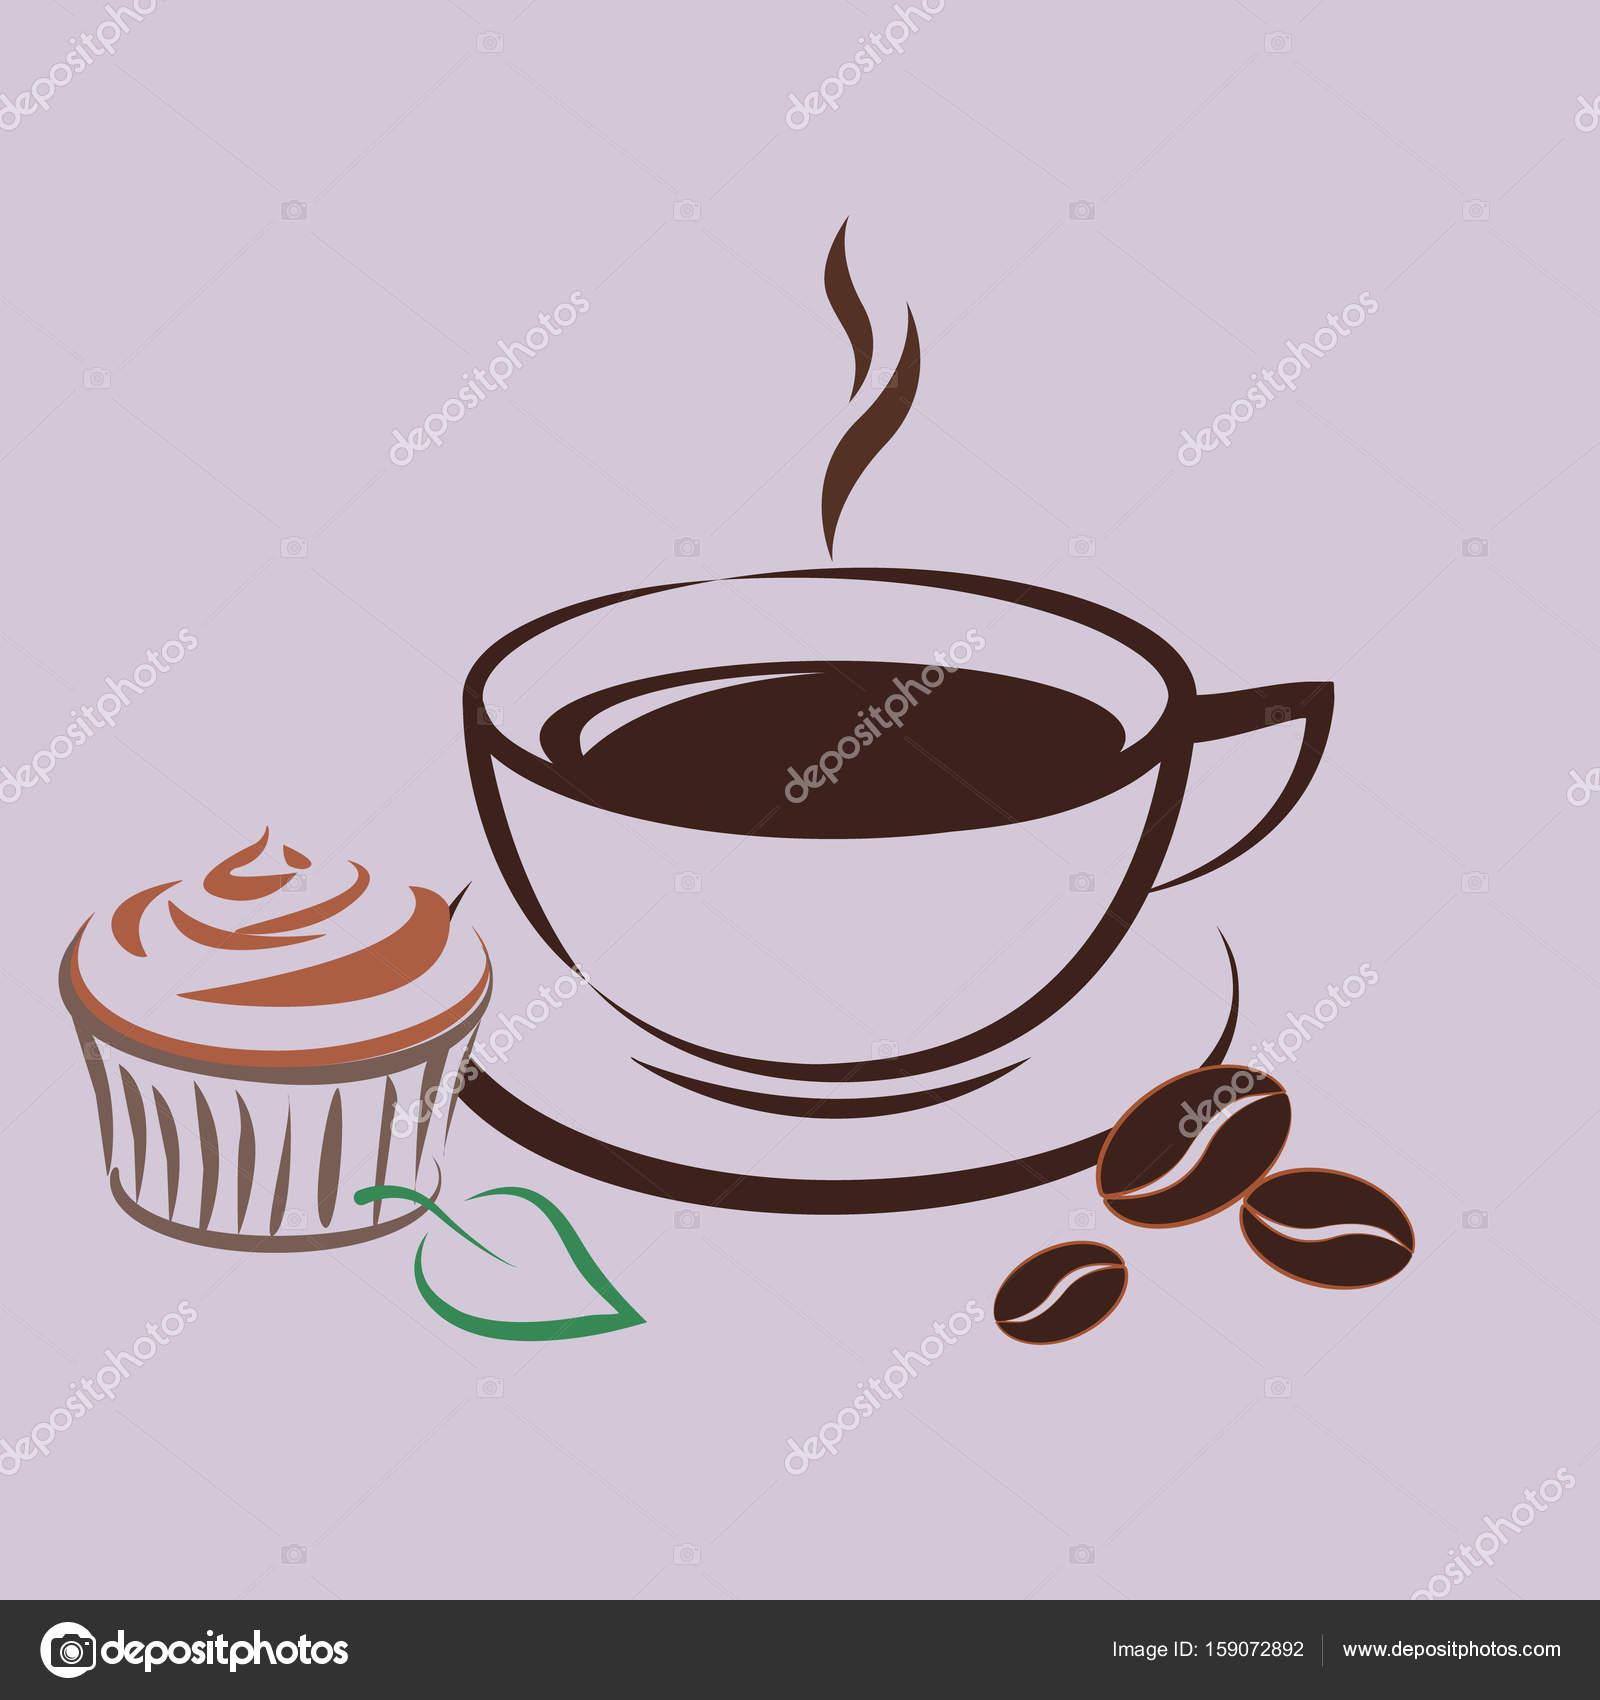 Vektor Icon Kaffee Becher Mit Kuchen Logo Stockvektor